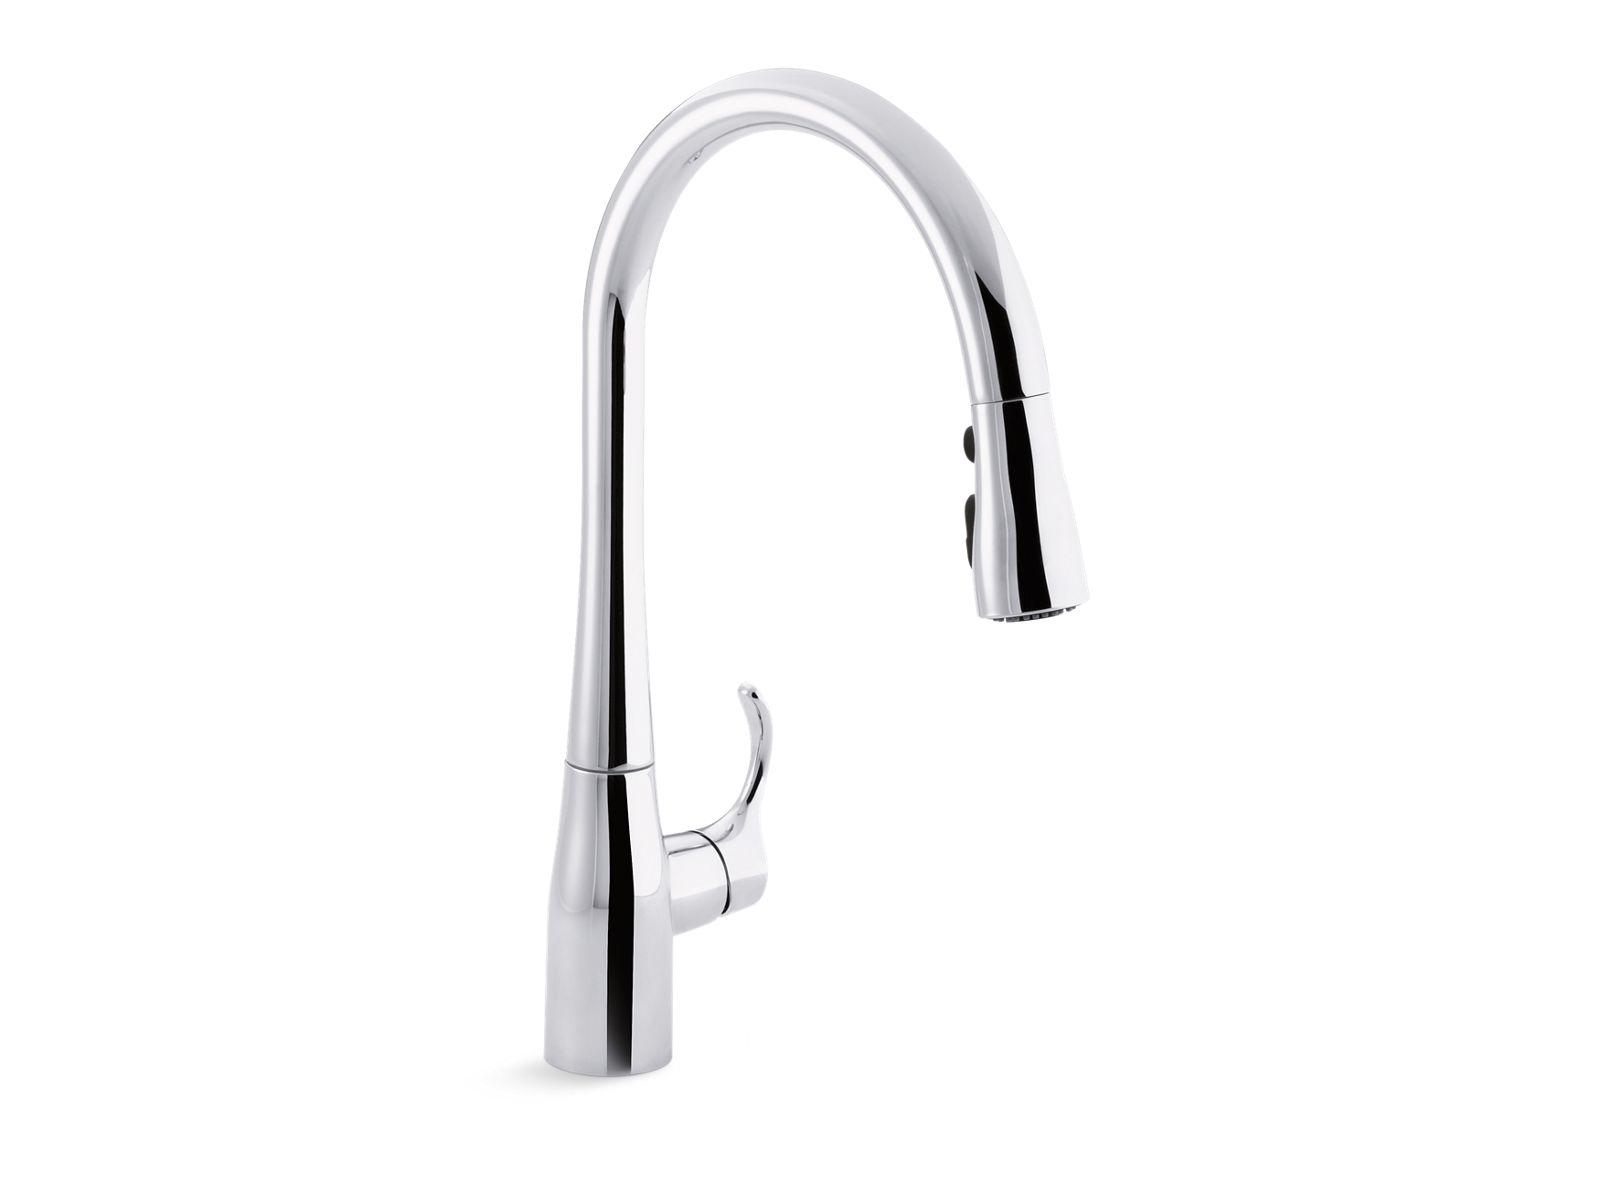 Etonnant K 596 | Simplice Single Handle Kitchen Sink Faucet | KOHLER